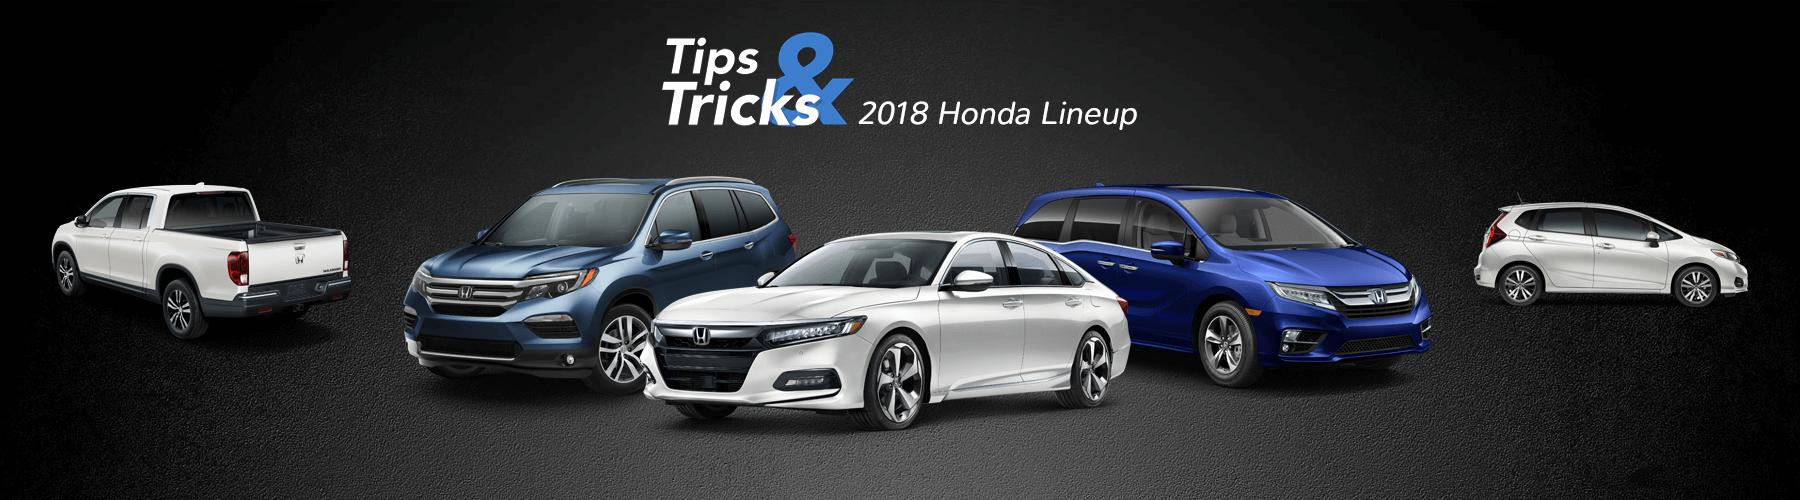 Honda Tips and Tricks Banner